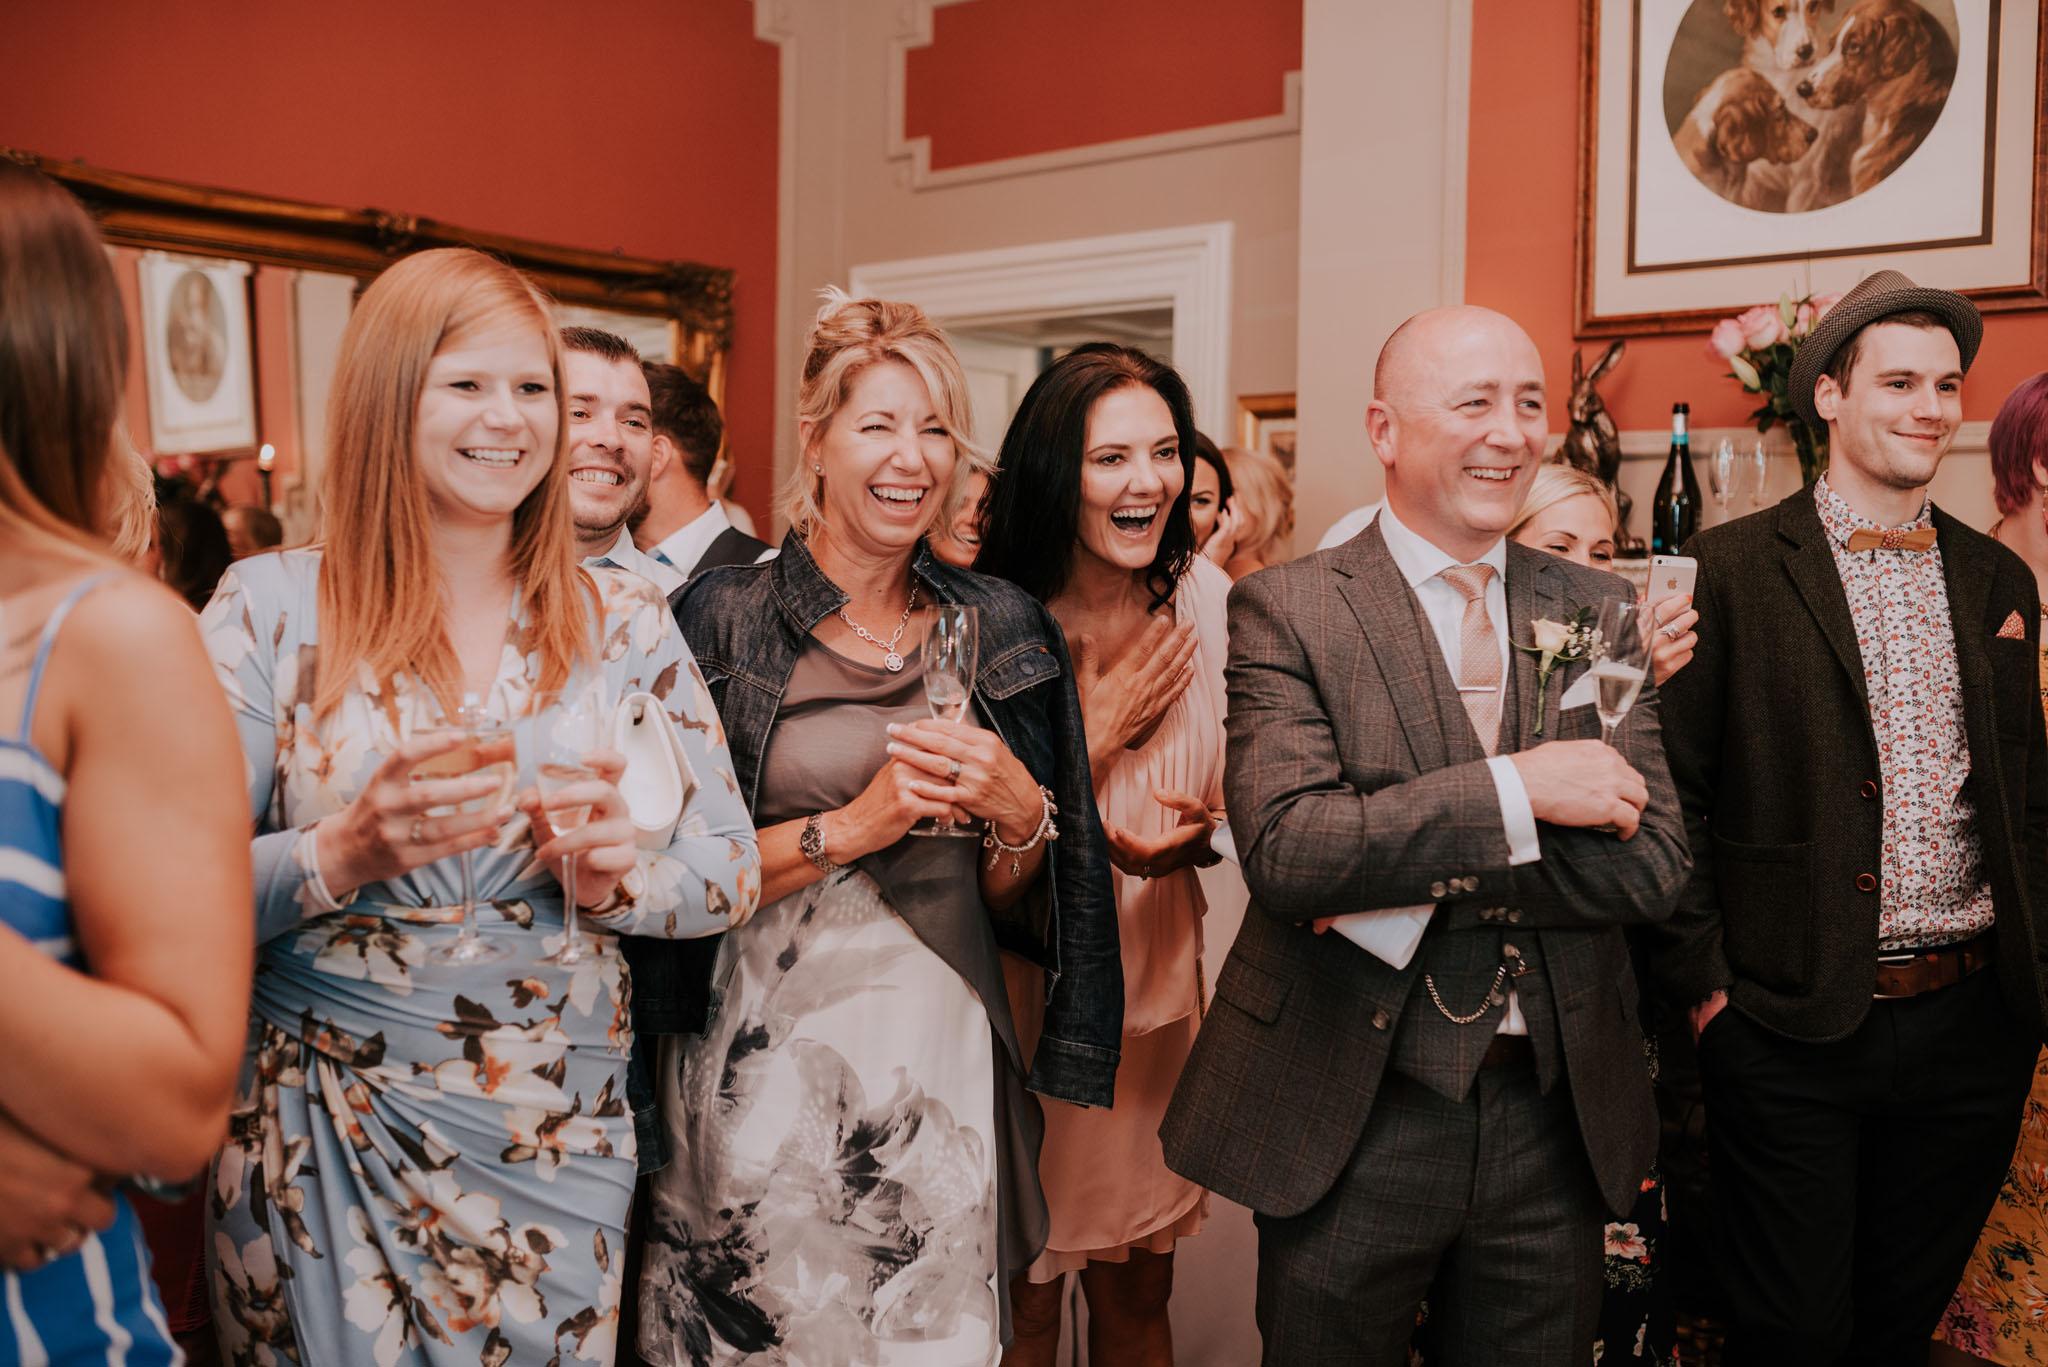 wedding-photographer-glewstone-court-hereford-scott-stockwell-photography435.jpg